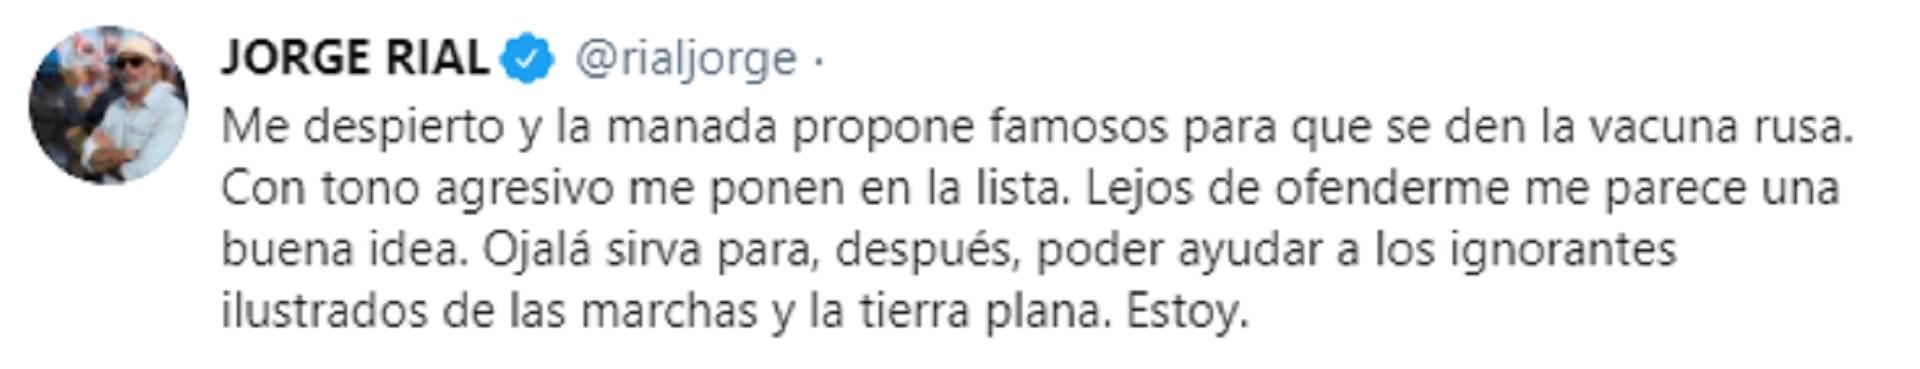 El tuit de Jorge Rial